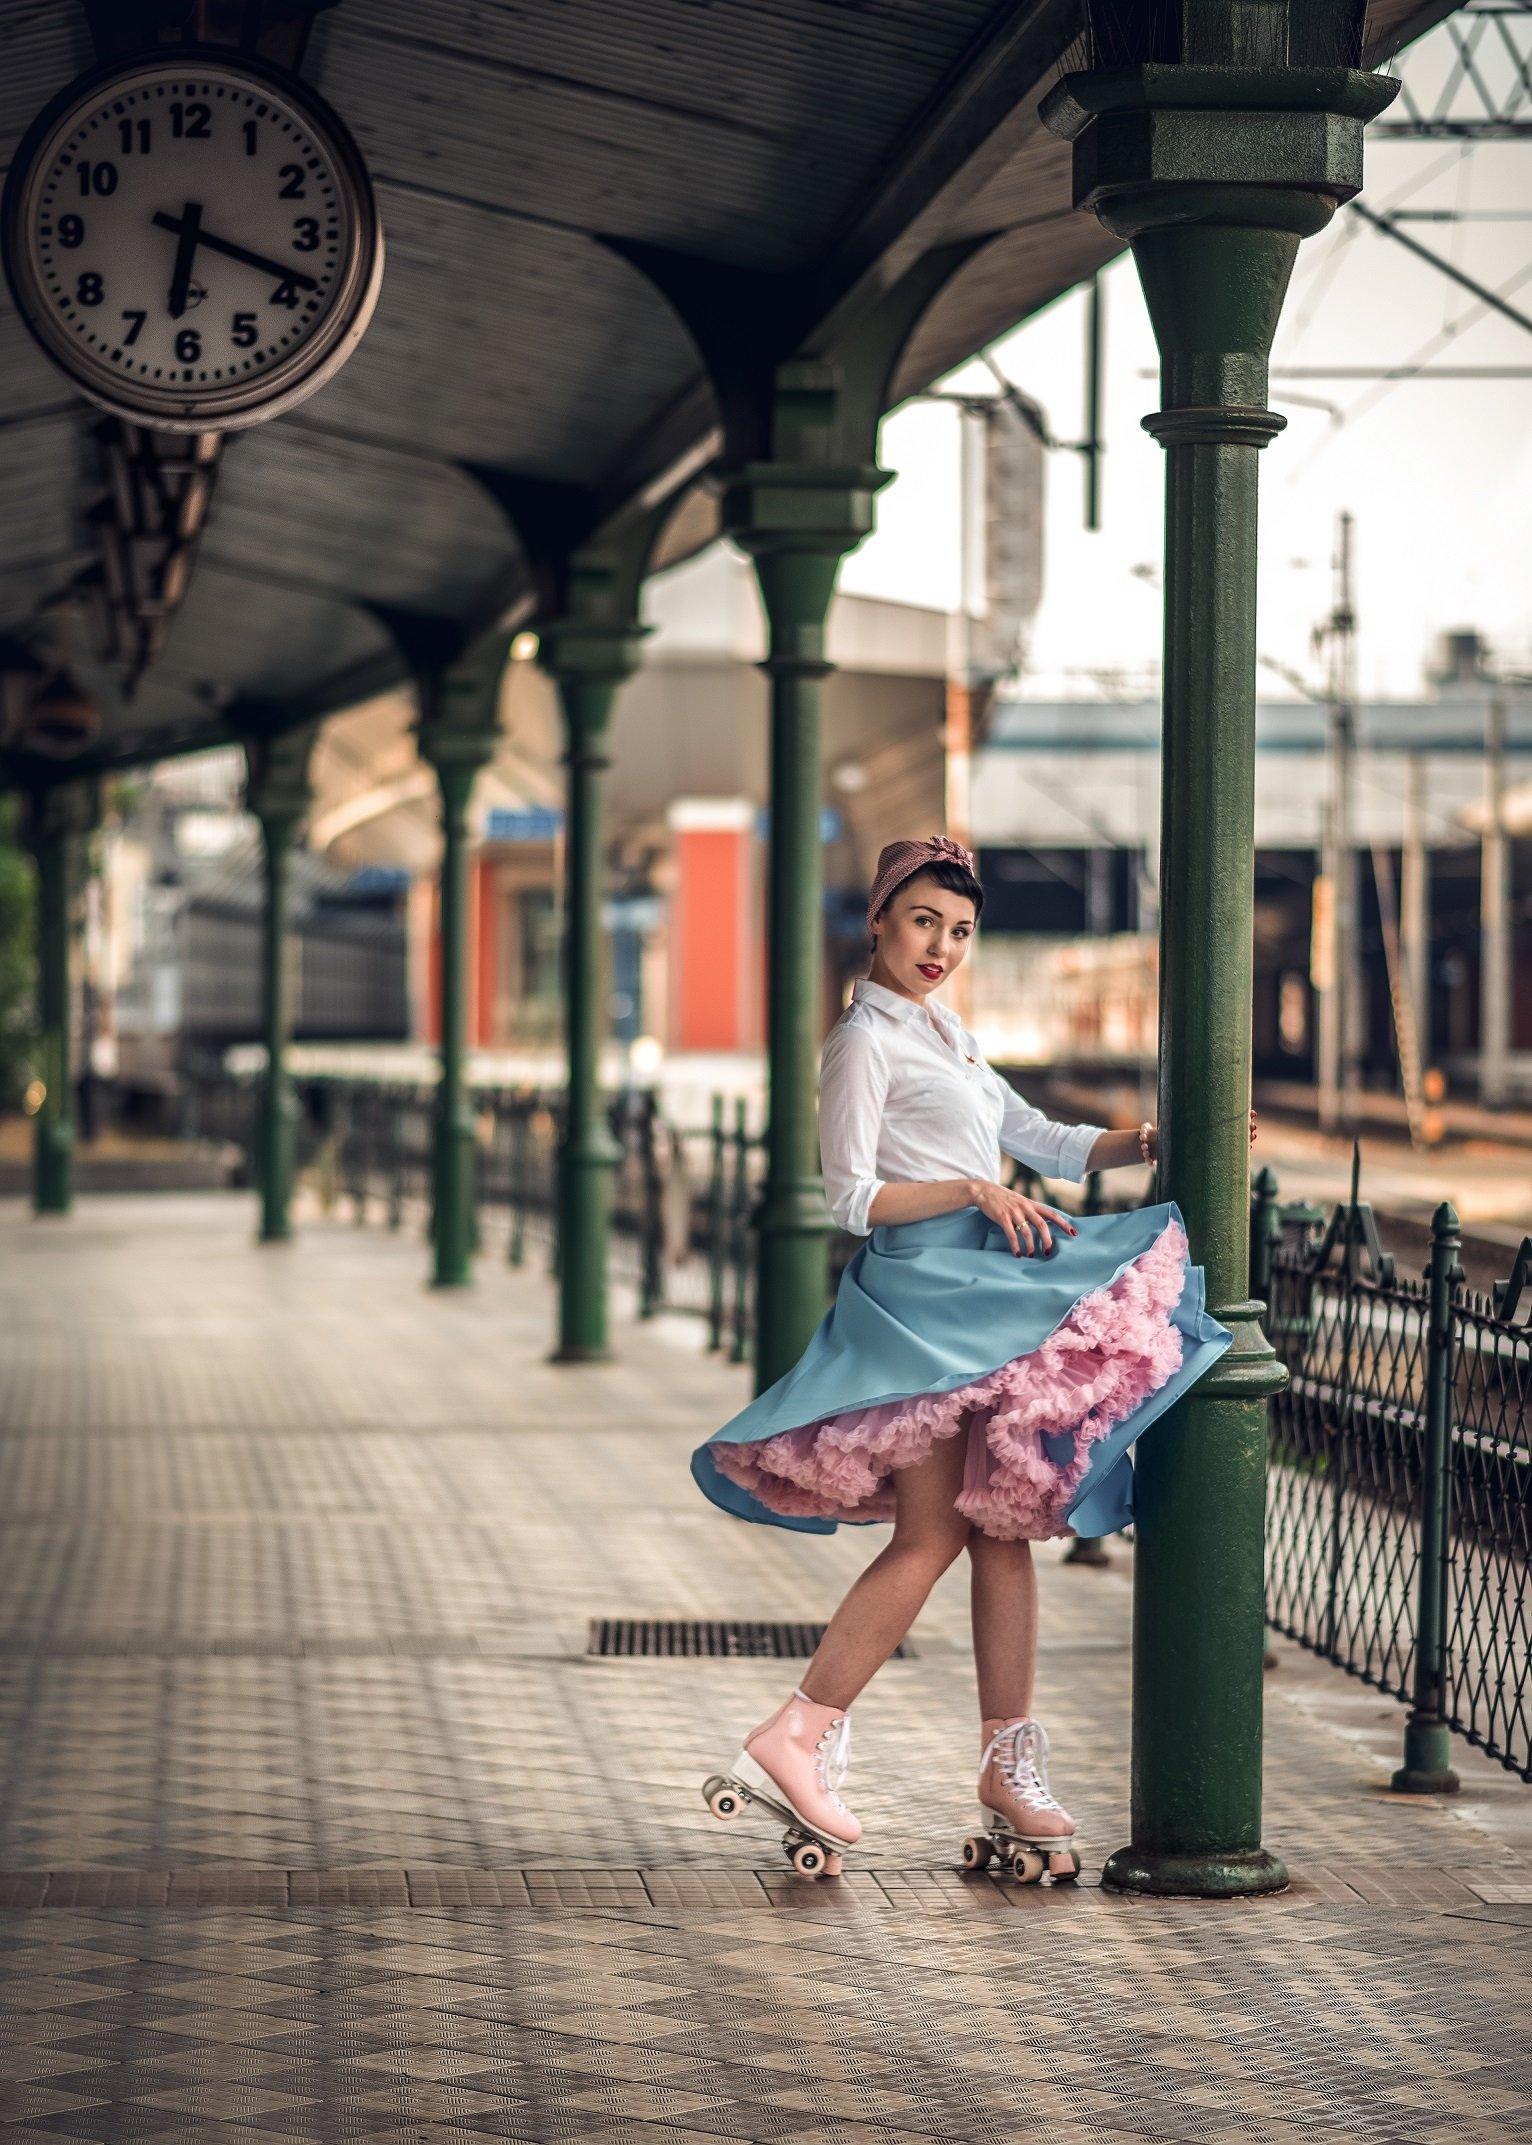 retro woman portrait roller pin up station railway, ibiphoto